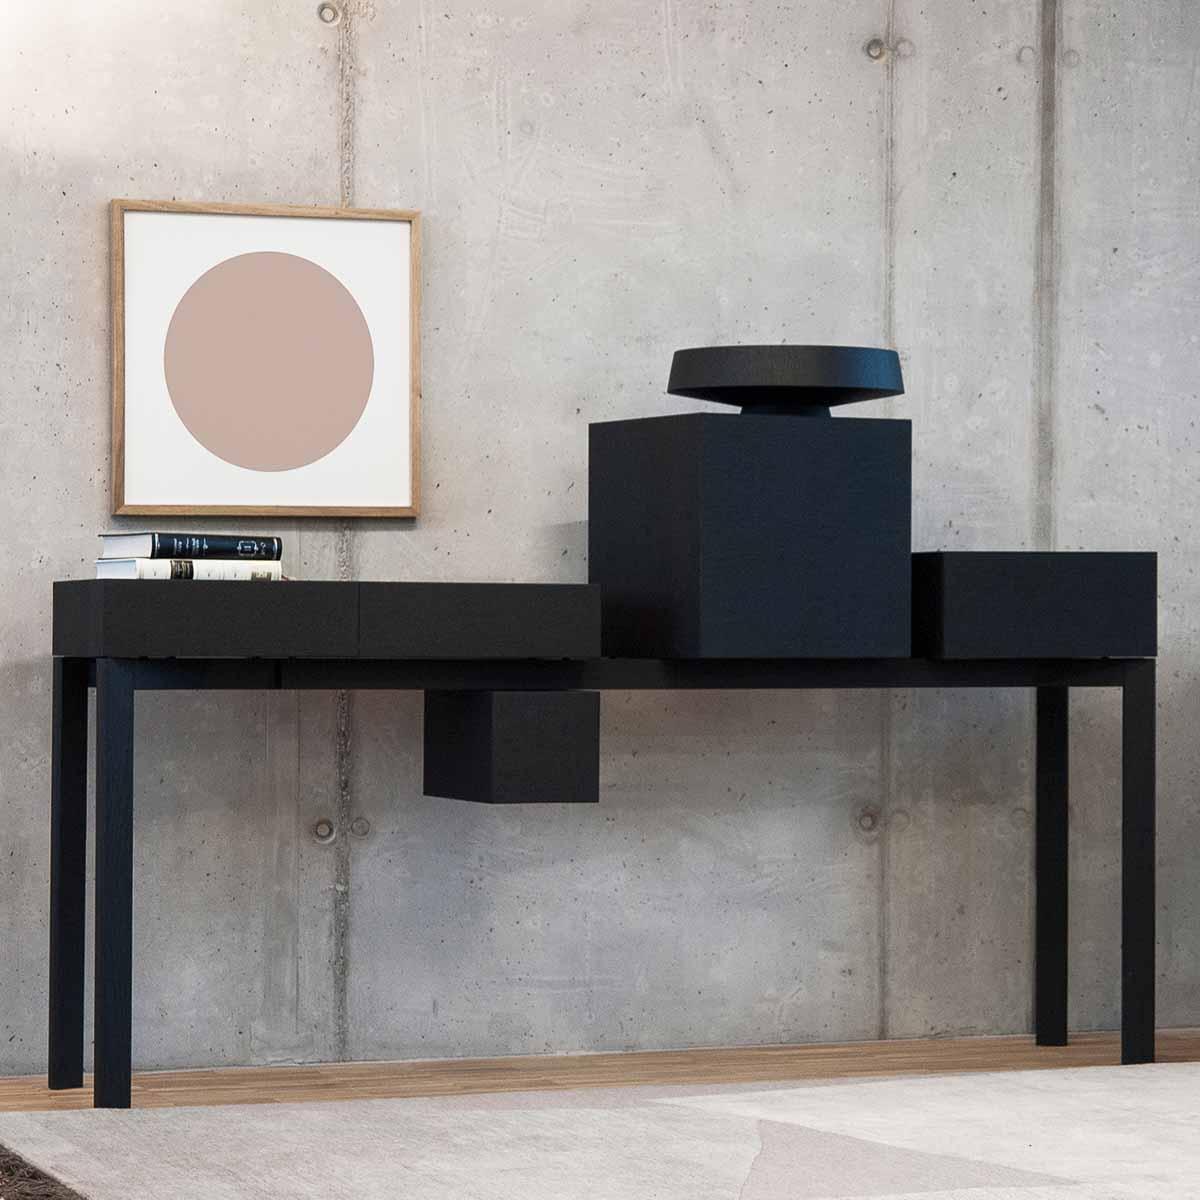 One Plus Elven Möbel in Editionen aus Berlin-7